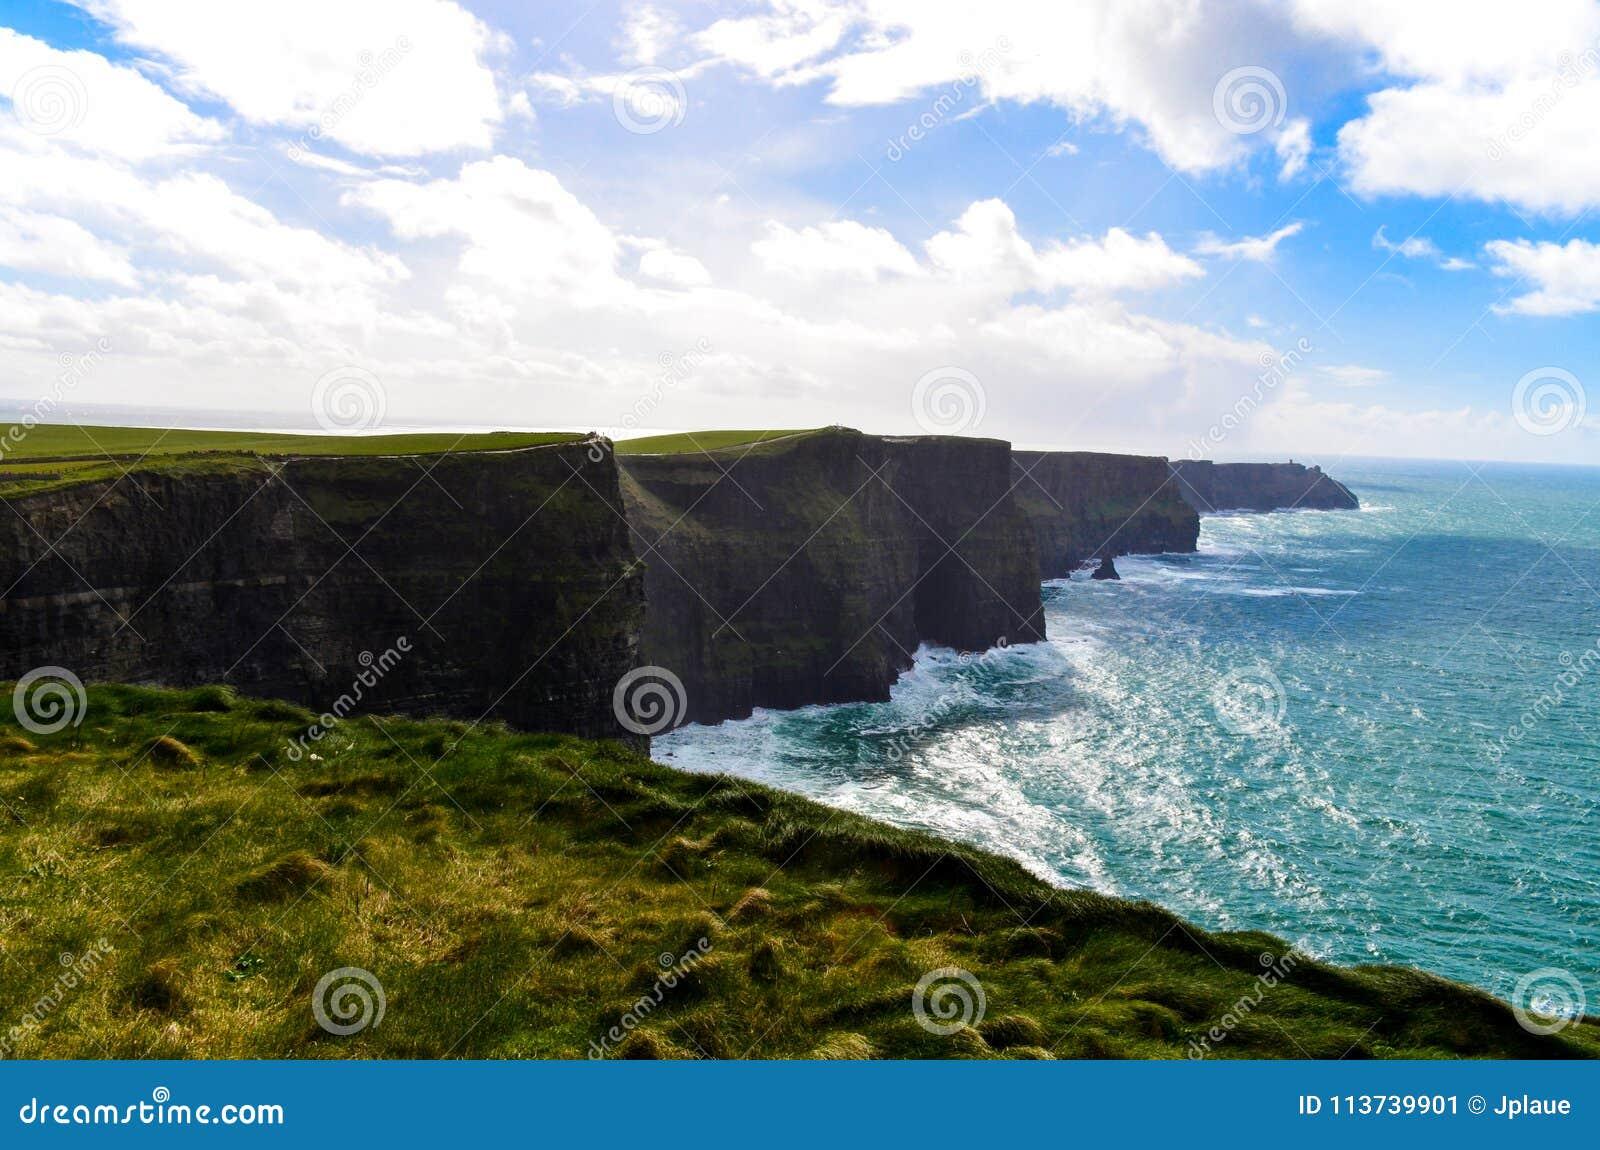 Cliffs of Moher Doolin Ireland Irish famous sightseeing cliff atlantiv ocean hiking scenic coastline